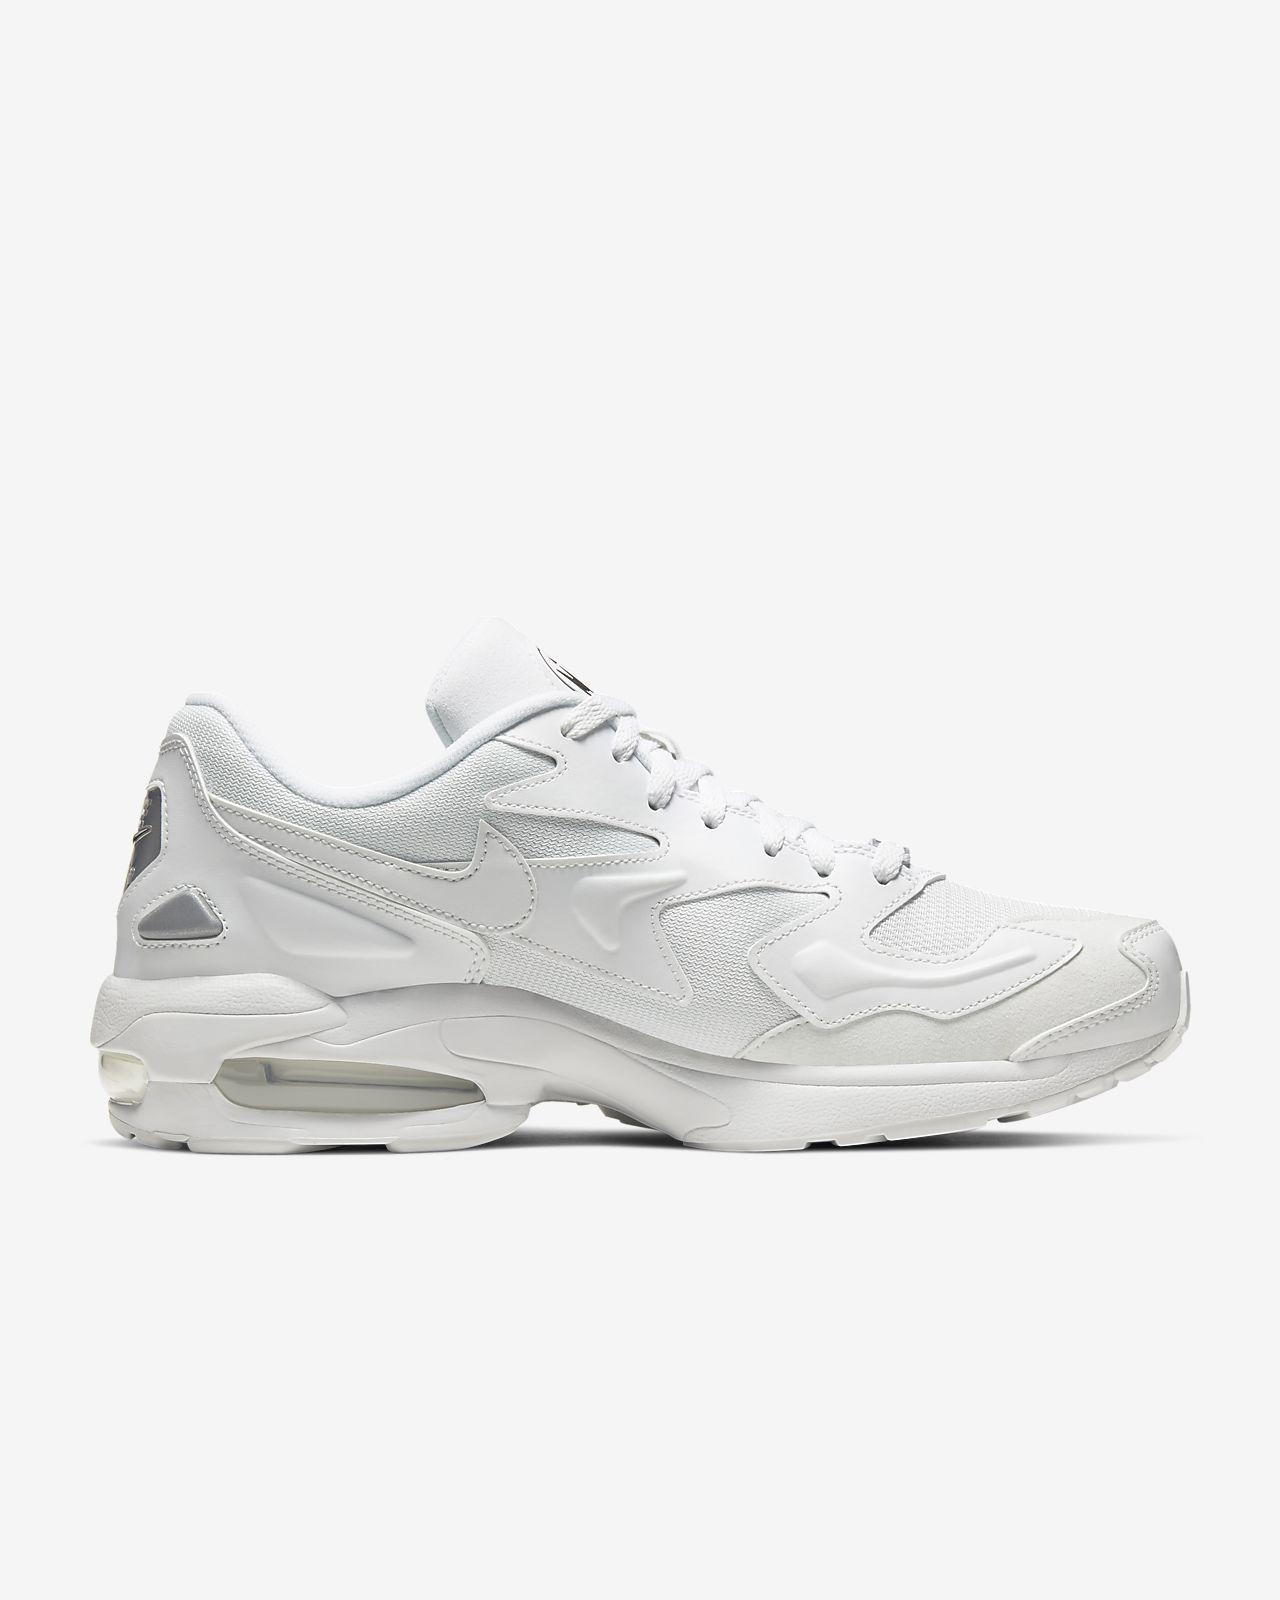 187f89e944866 Nike Air Max2 Light Men's Shoe. Nike.com GB